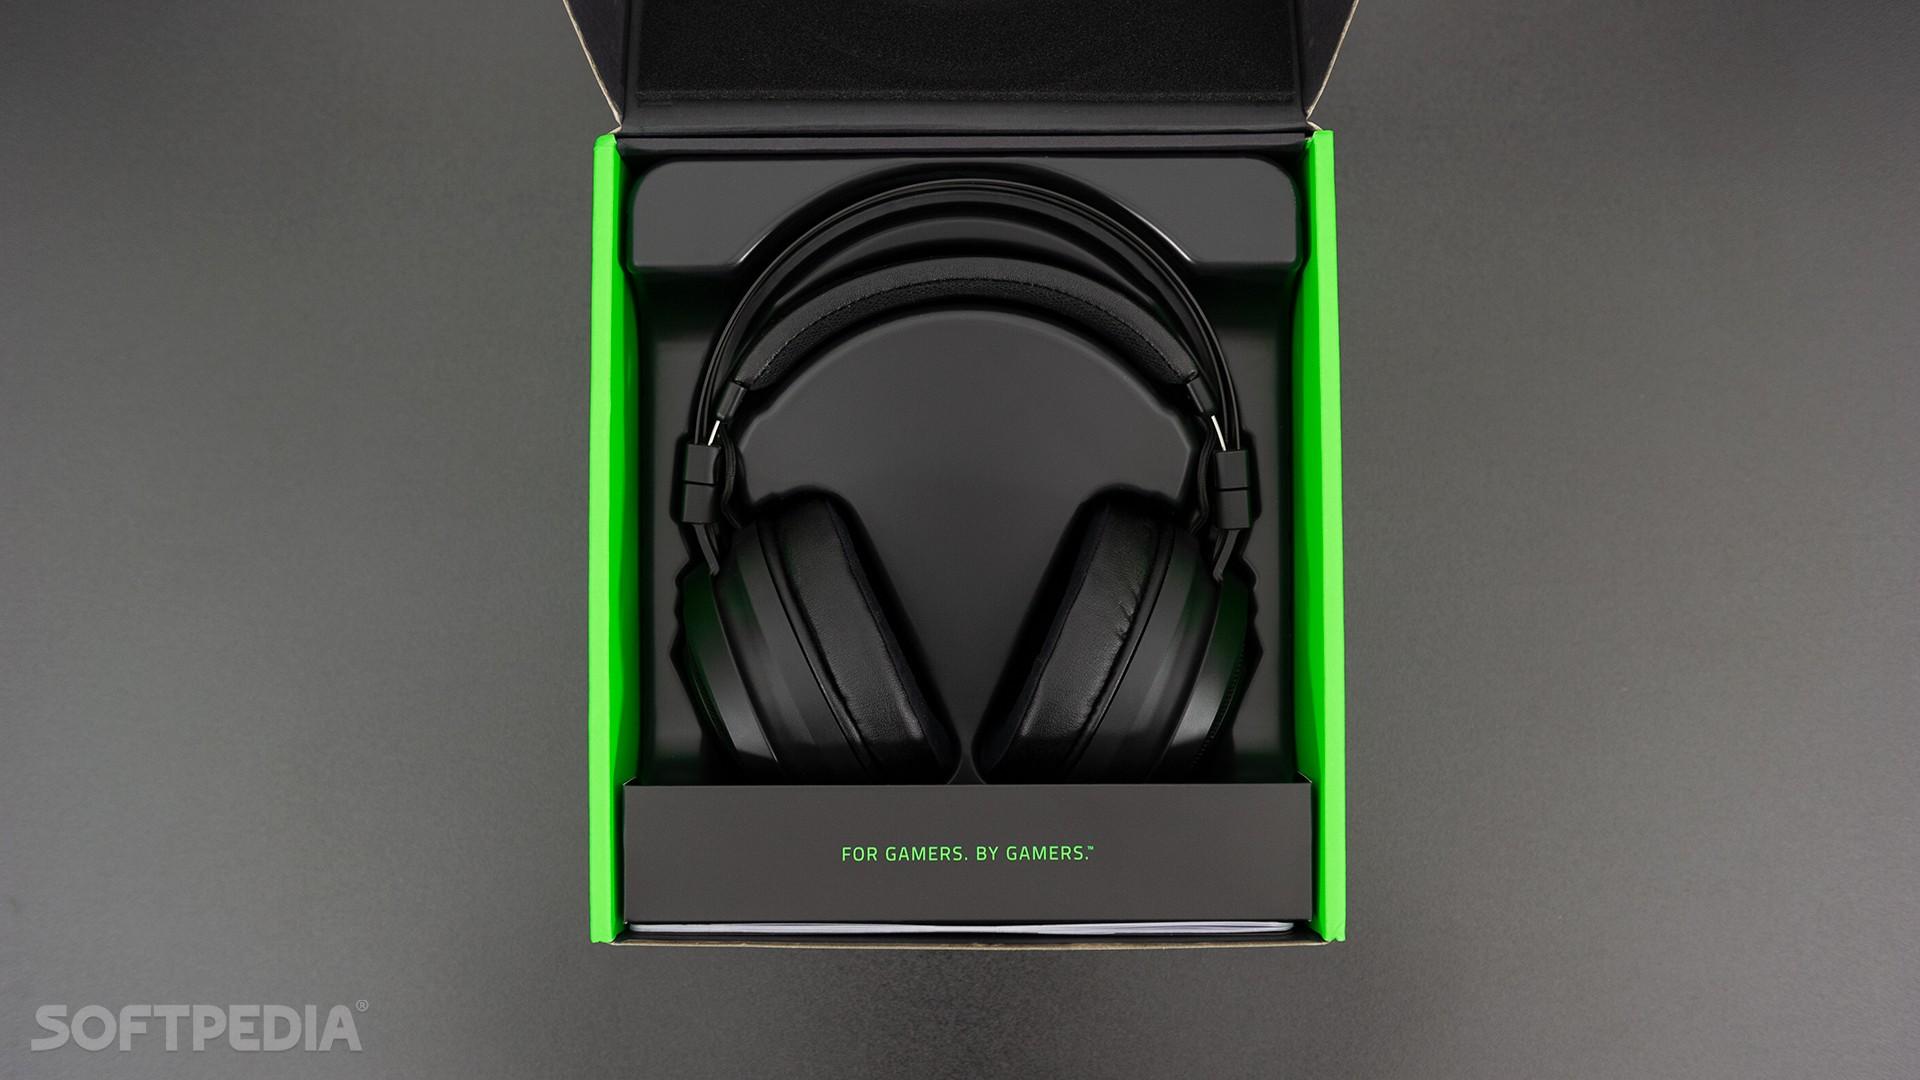 Razer Nari Review - A True Gaming Headset